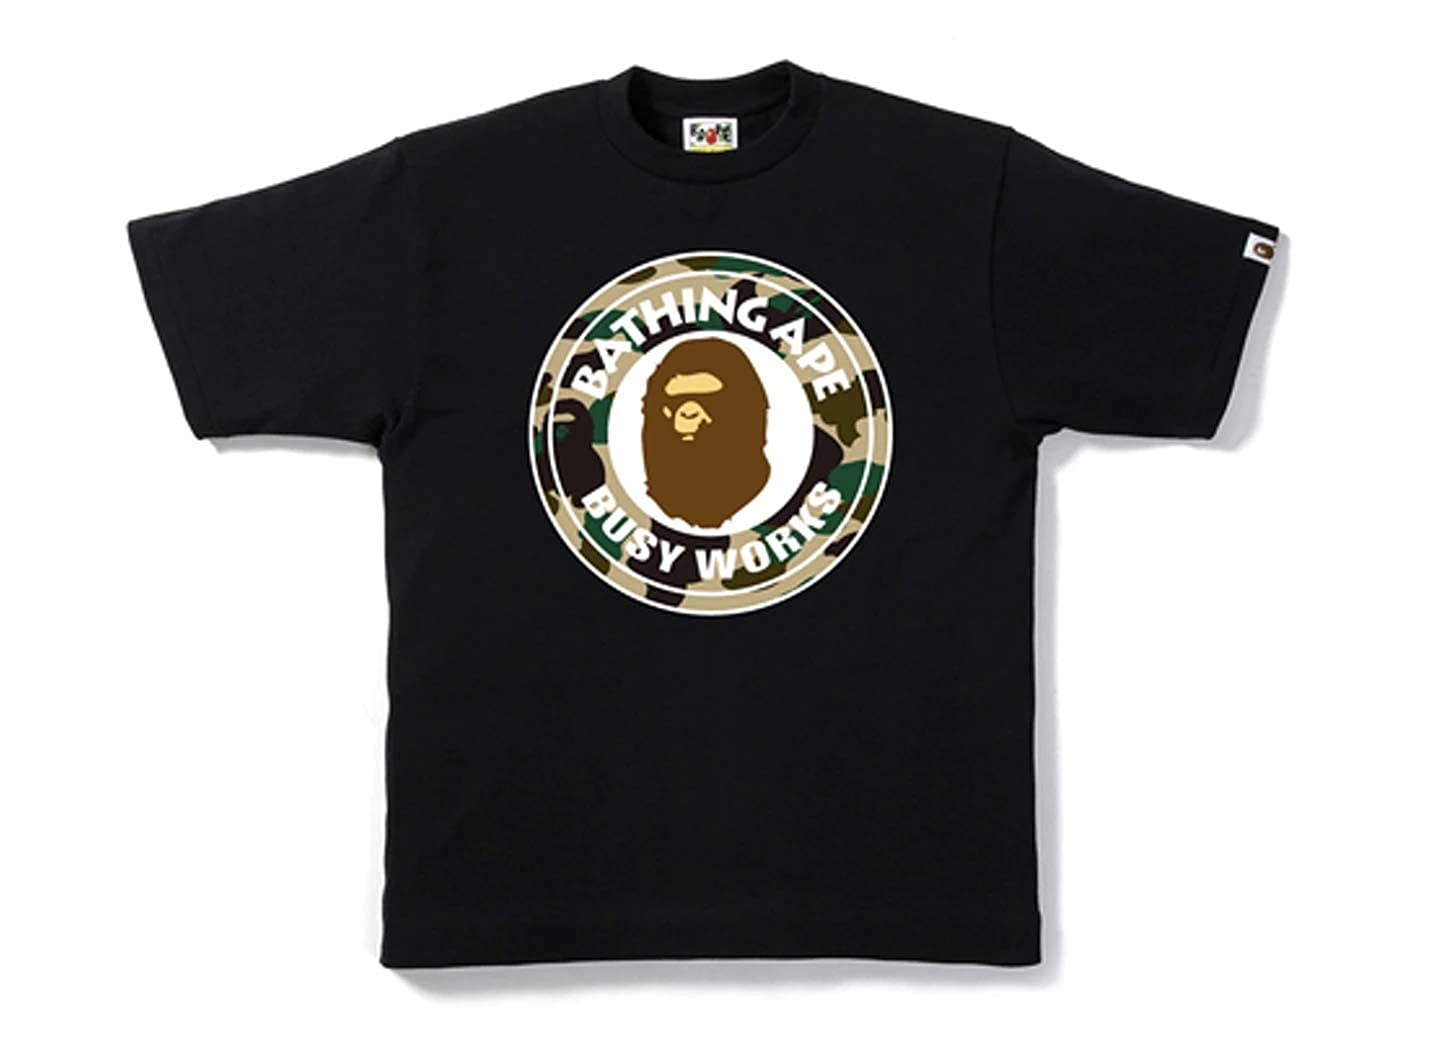 916d680d Amazon.com: Bape by Bathing Ape Mens Camo Mens Tee Shirt Authentic: Clothing